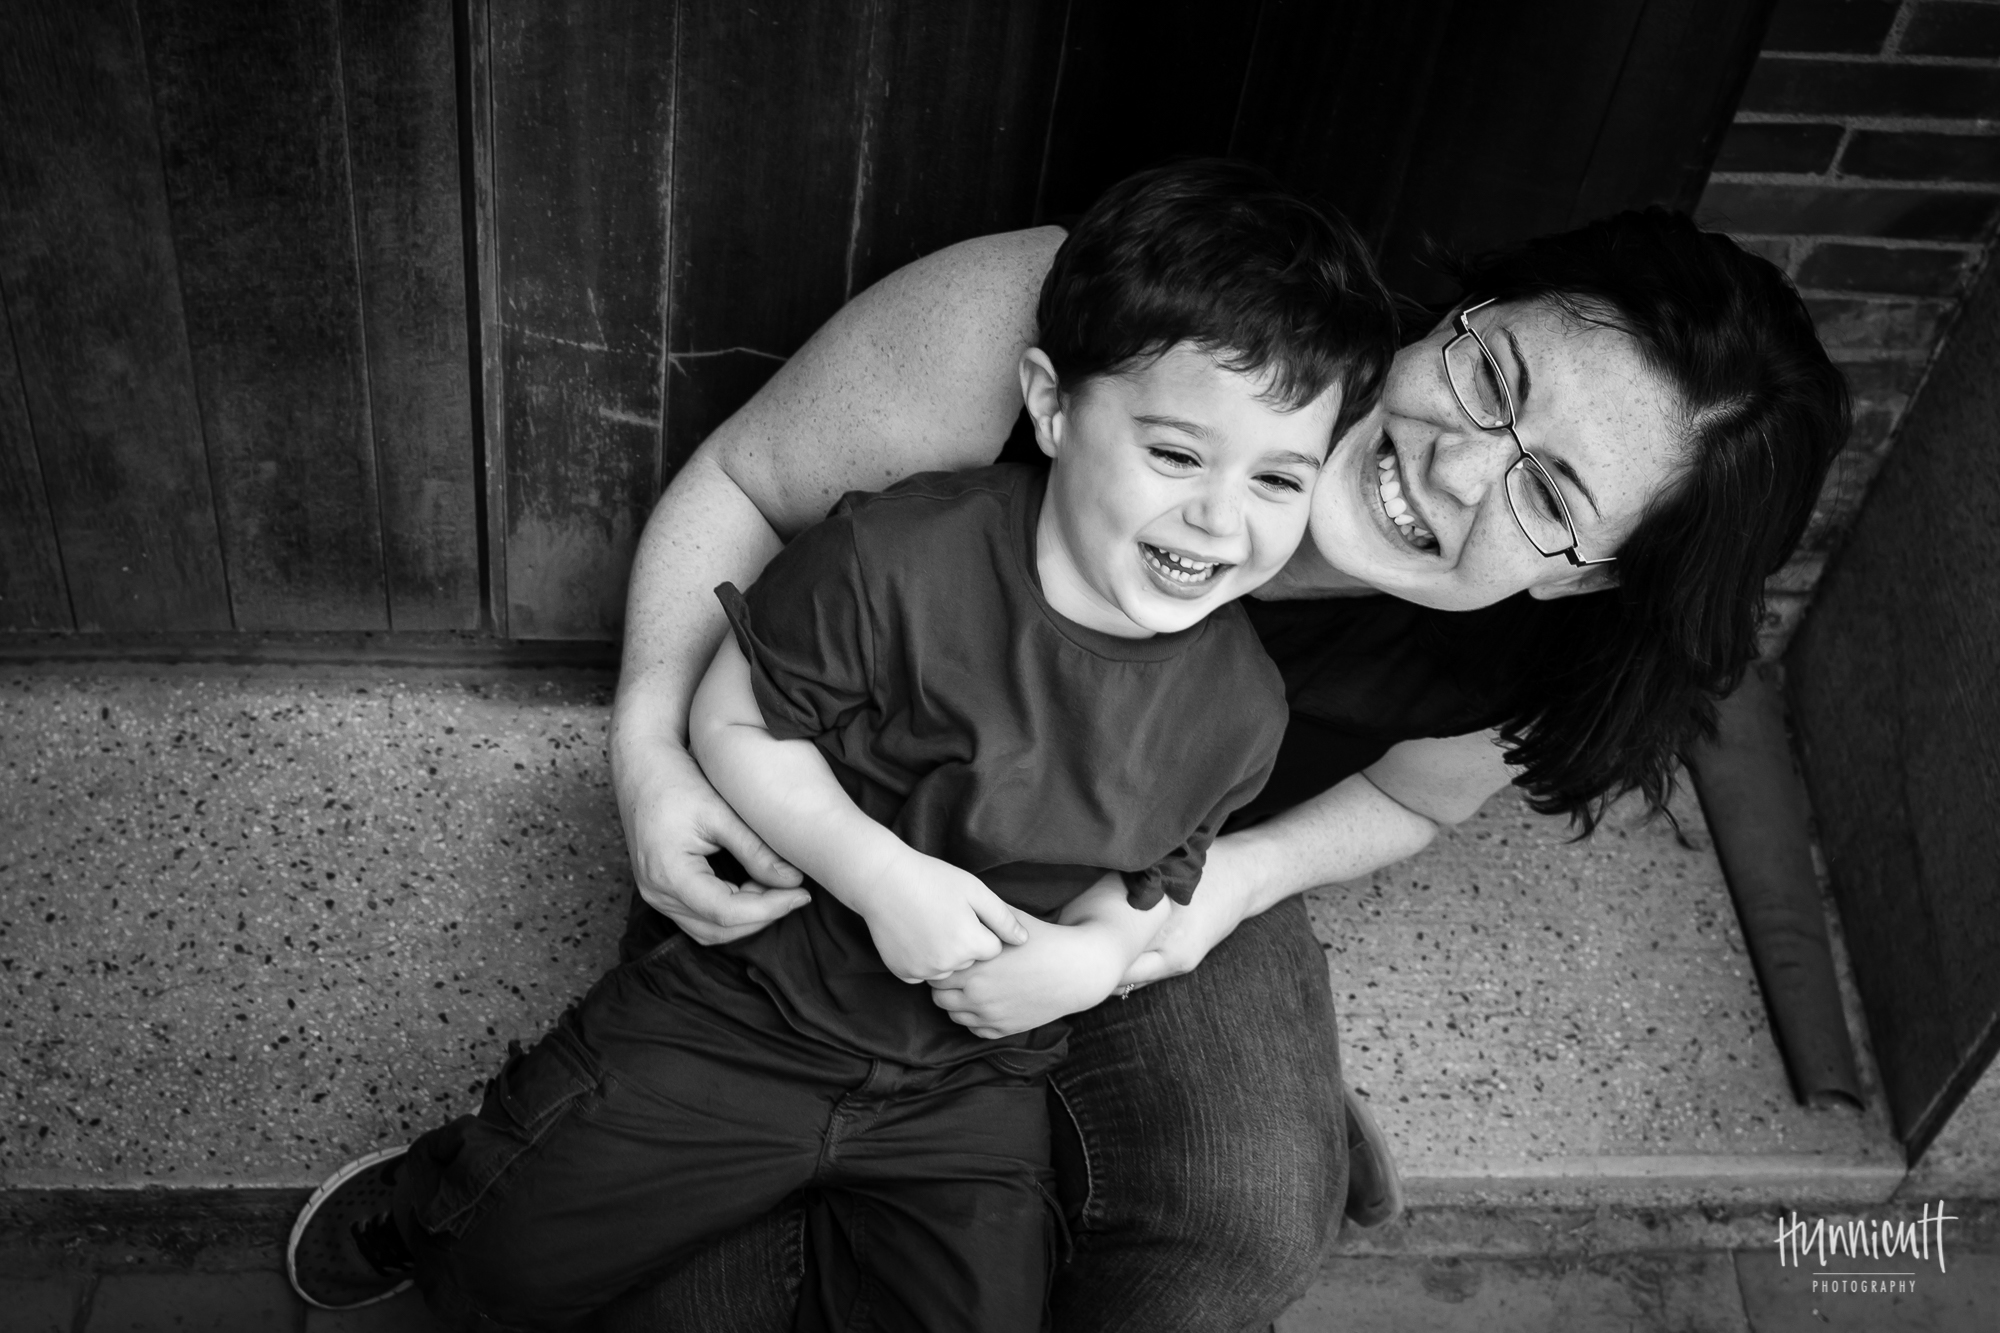 Family-Outdoor-Lifestyle-Modern-Urban-Travel-Culture-HunnicuttPhotography-RebeccaHunnicuttFarren-Taichung-Taiwan-11